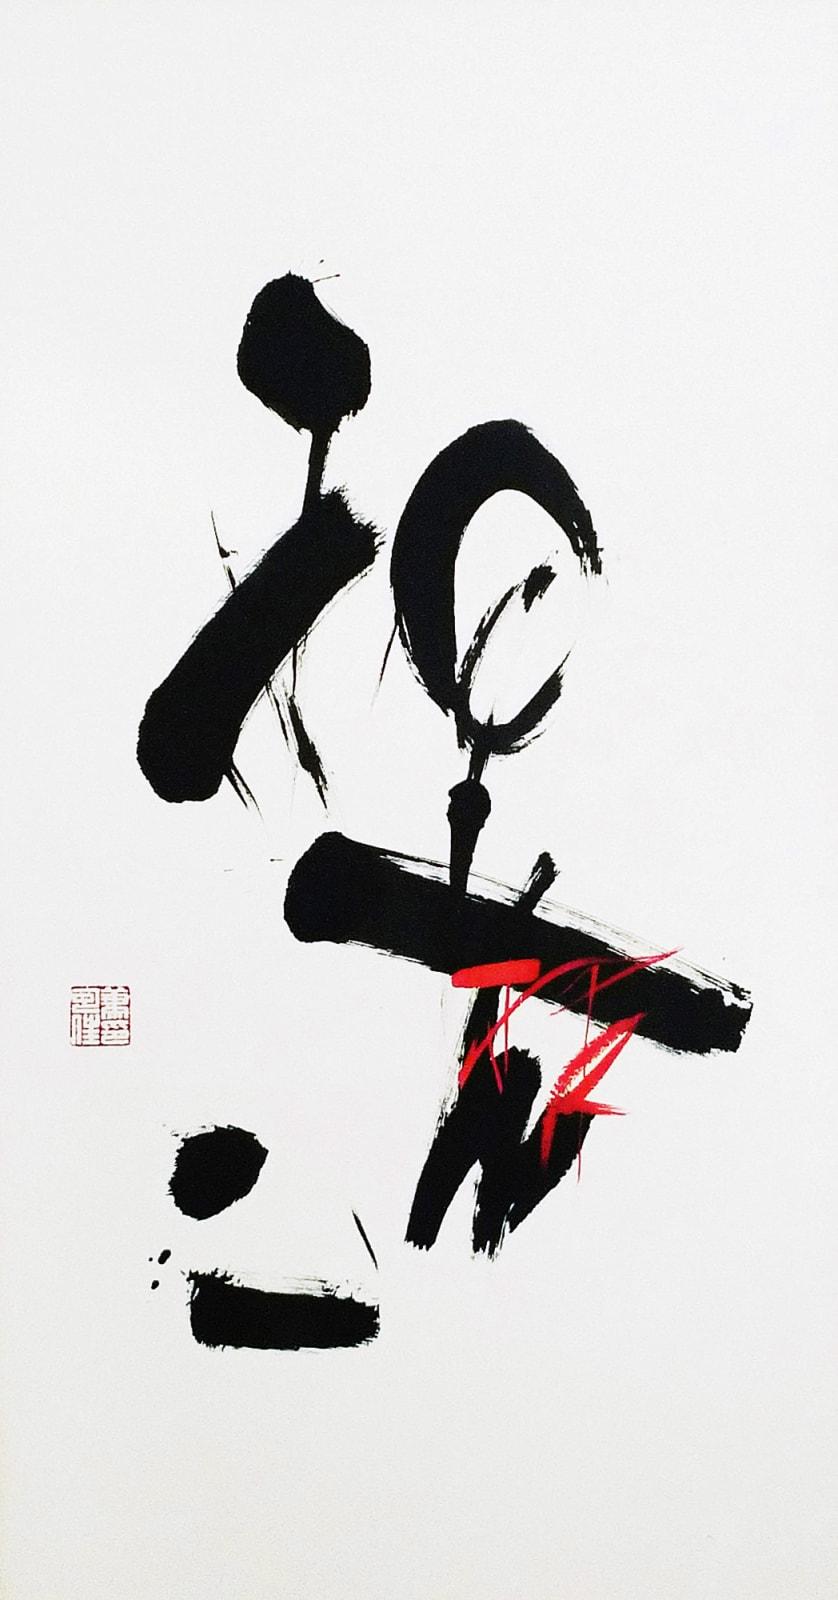 Katherine Xiao 蕭可佳, Choice 選擇, 2009